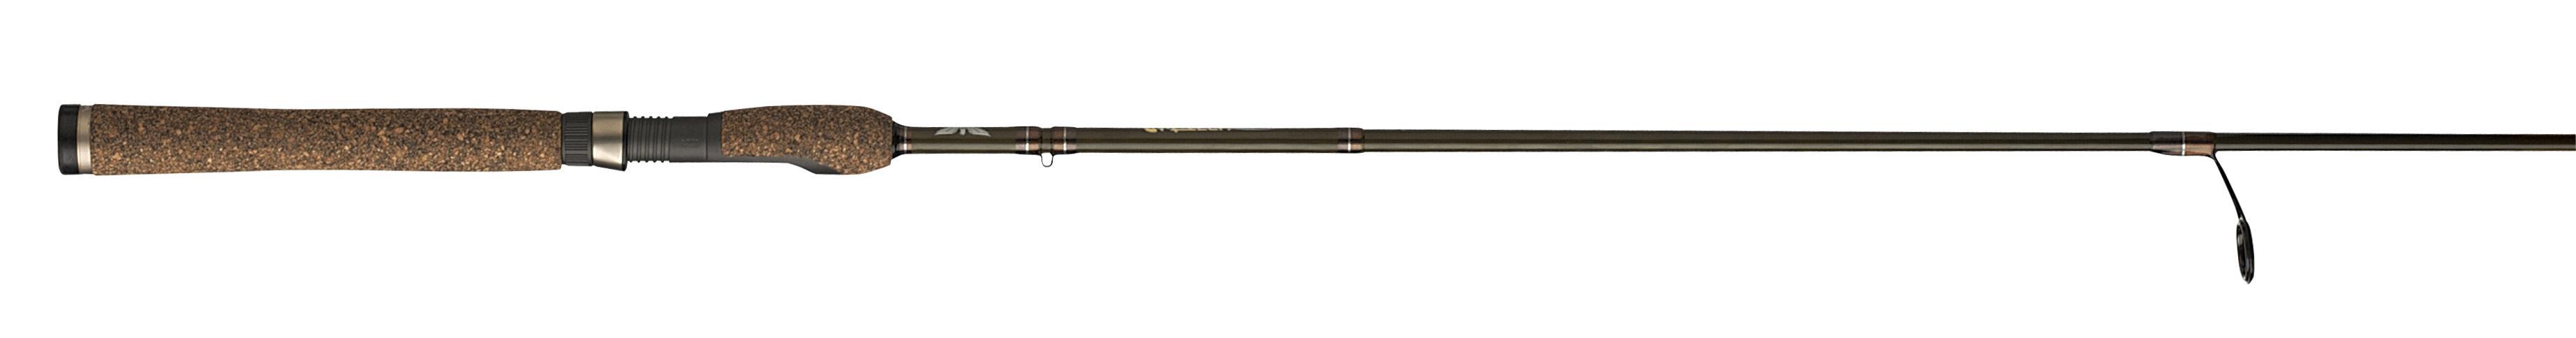 Fenwick Elite Tech Walleye Jigging Fishing Rod - Thumbnail 2